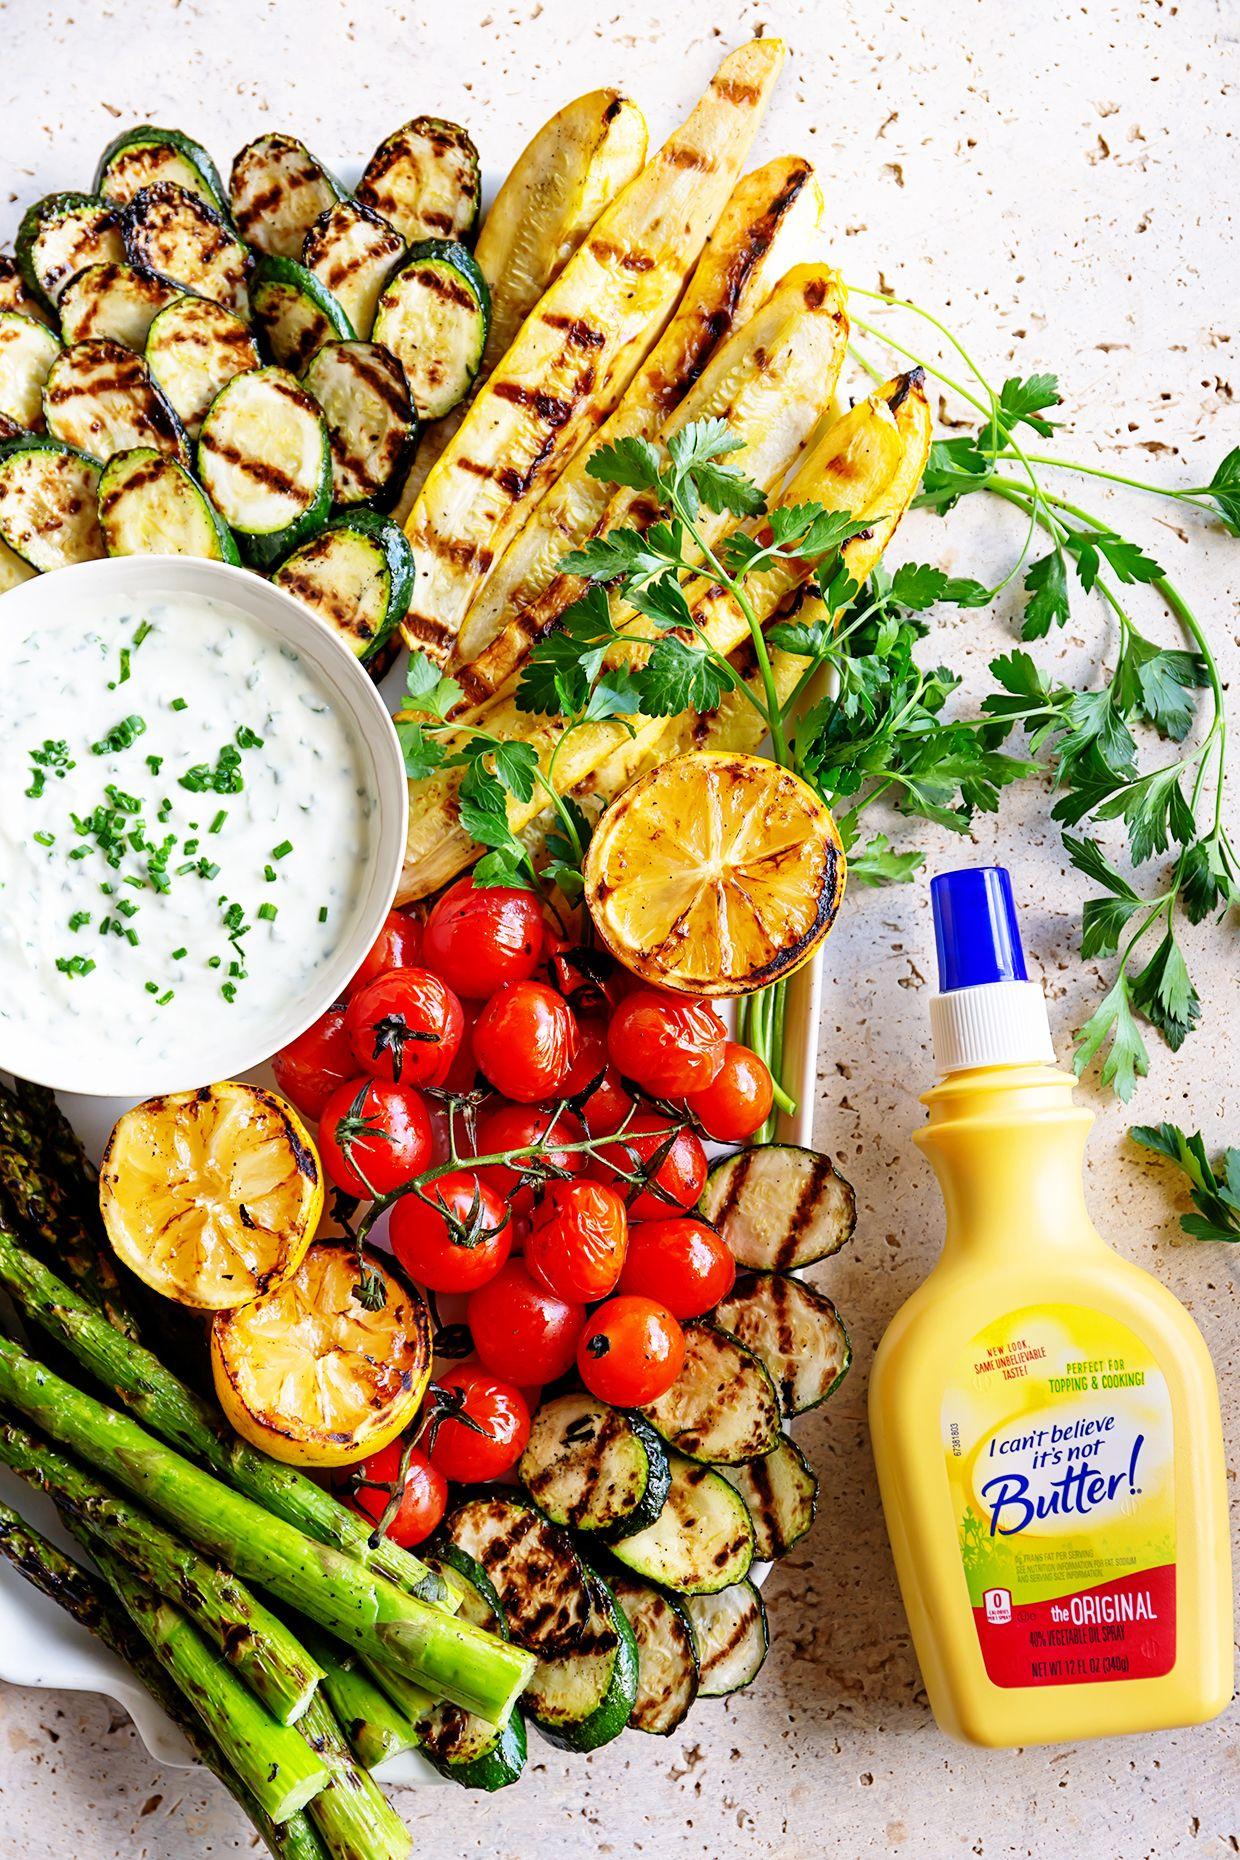 Grilled veggie platter re cipe healthy grilling recipes